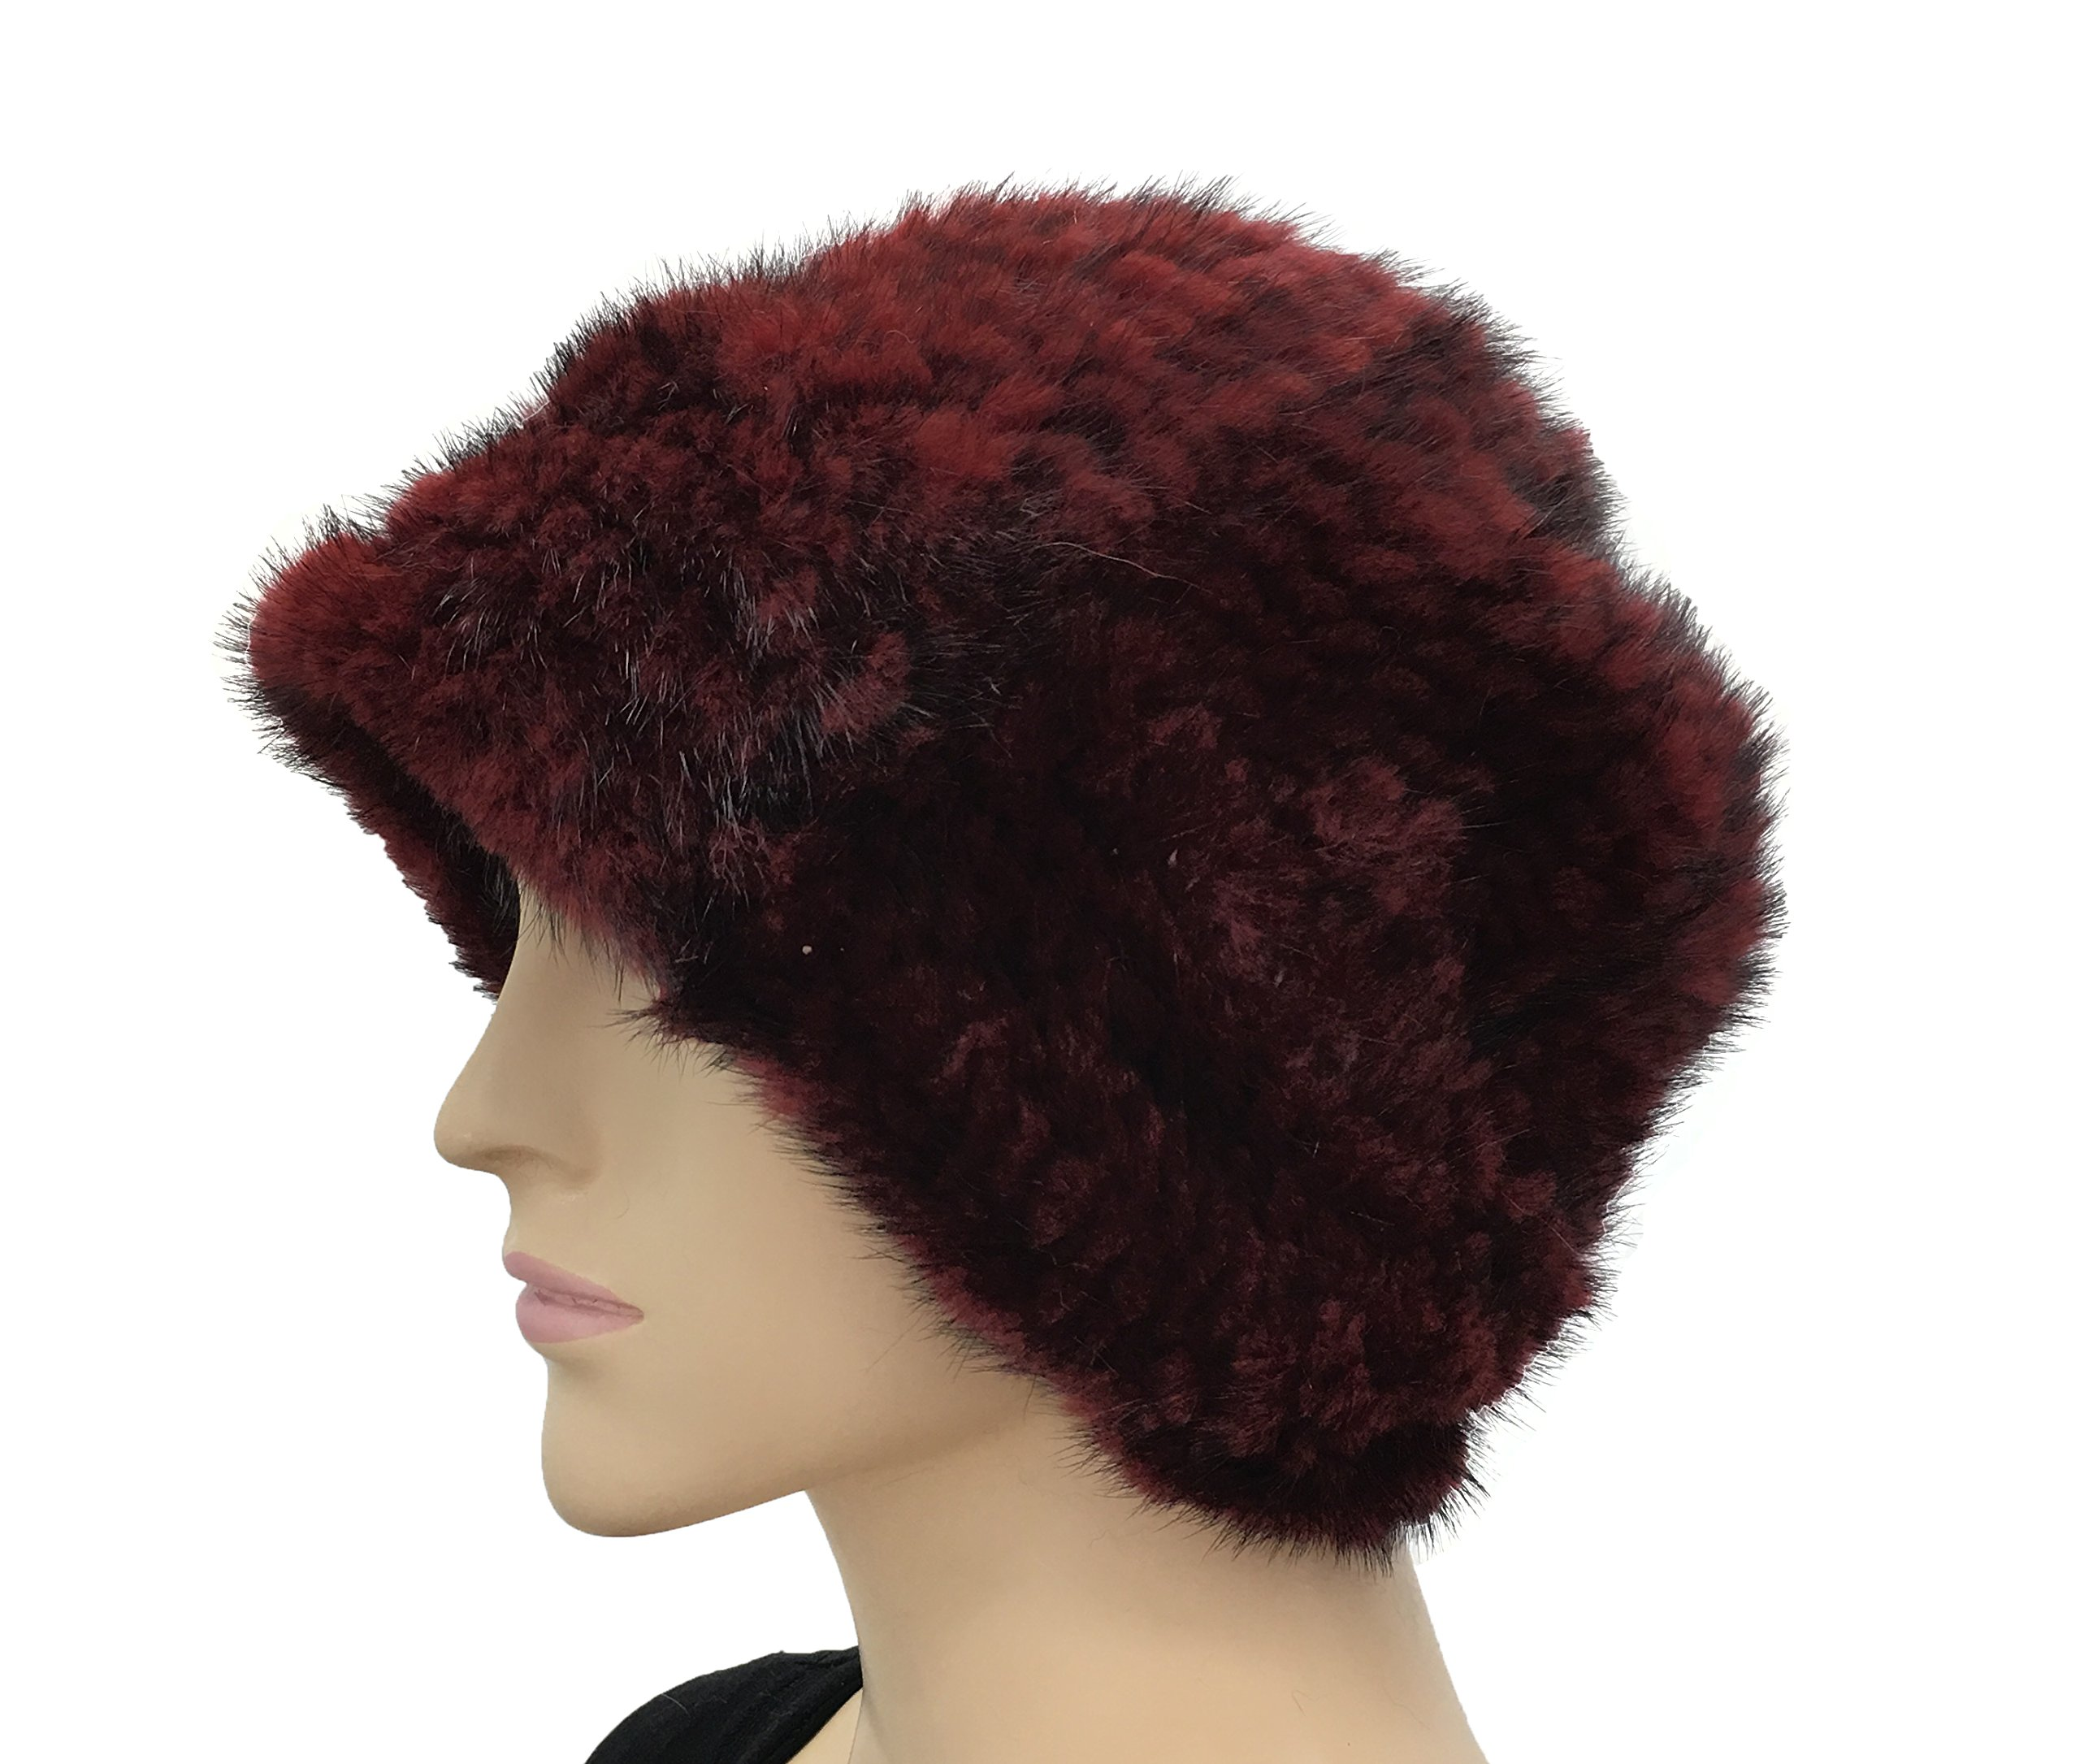 Hima Knit Mink Fur Roller Hat One Size 23'' (Burgandy) by Hima (Image #2)